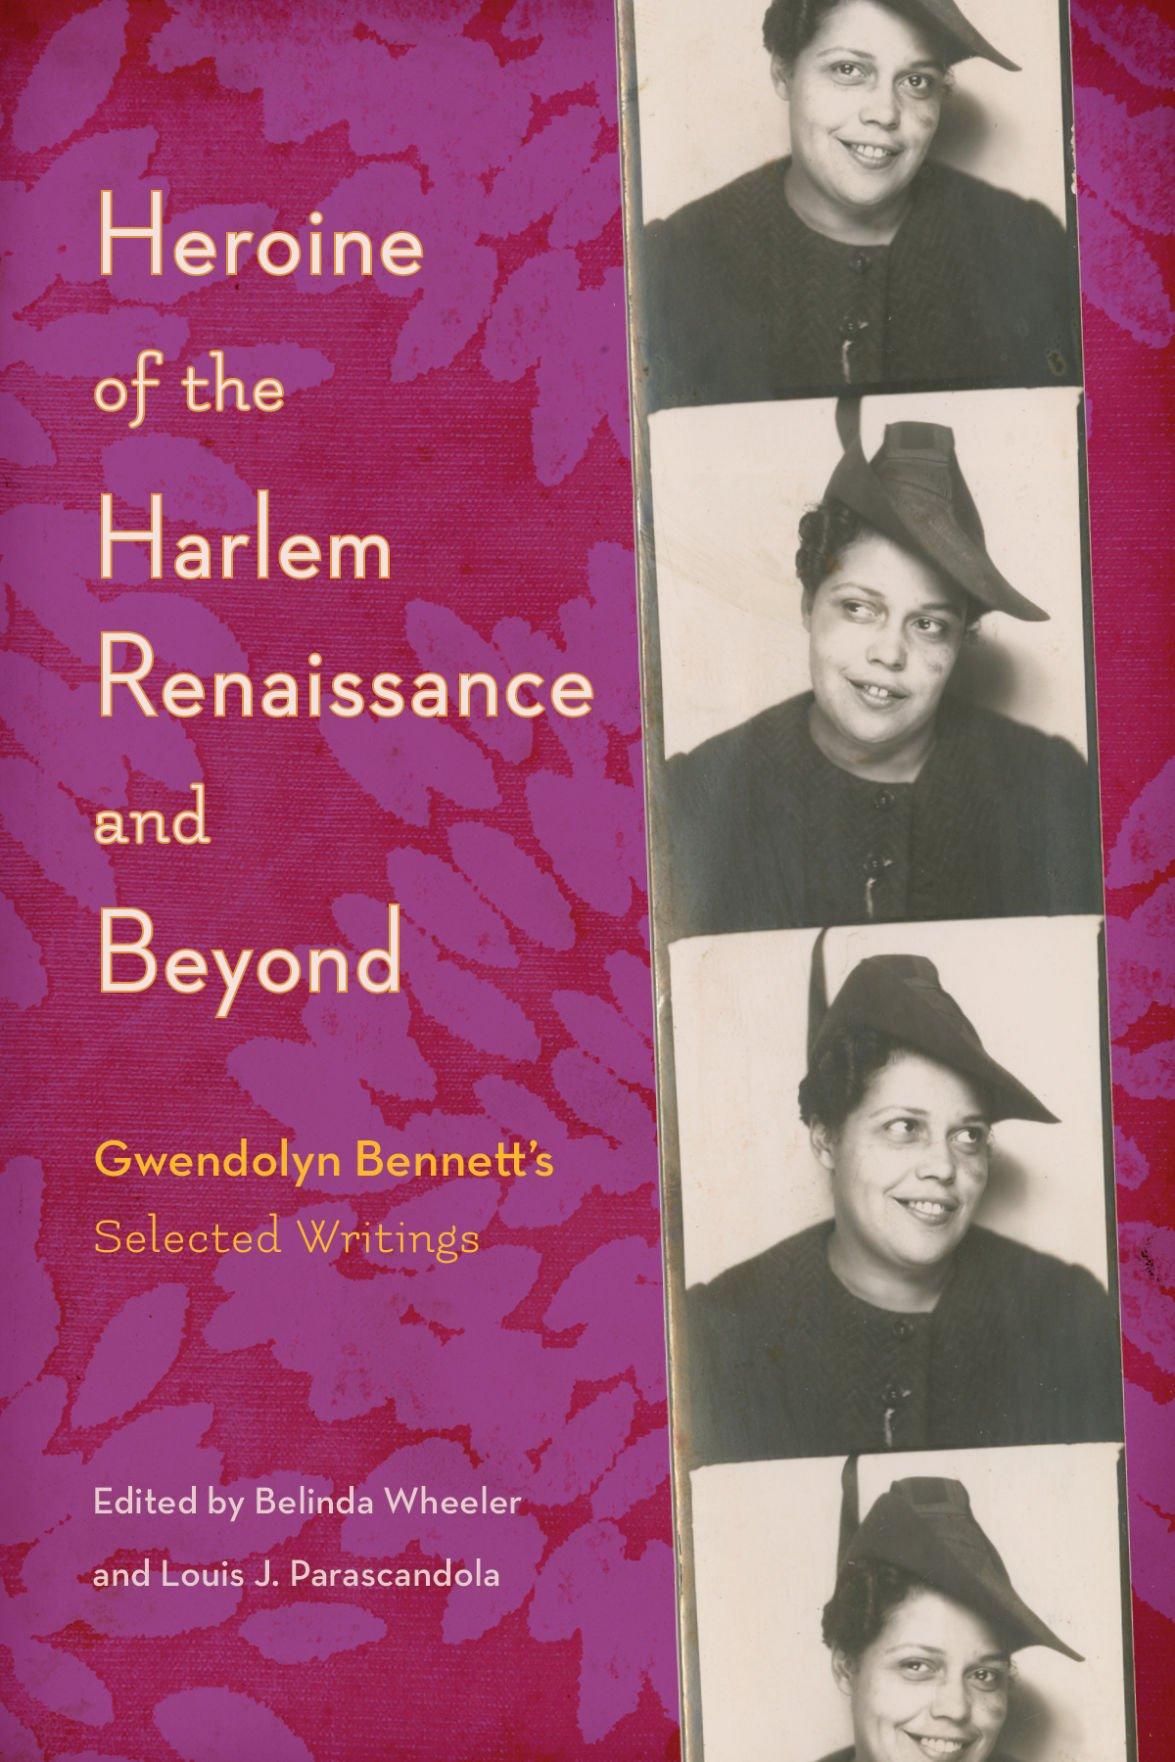 Heroine of the Harlem Renaissance and Beyond